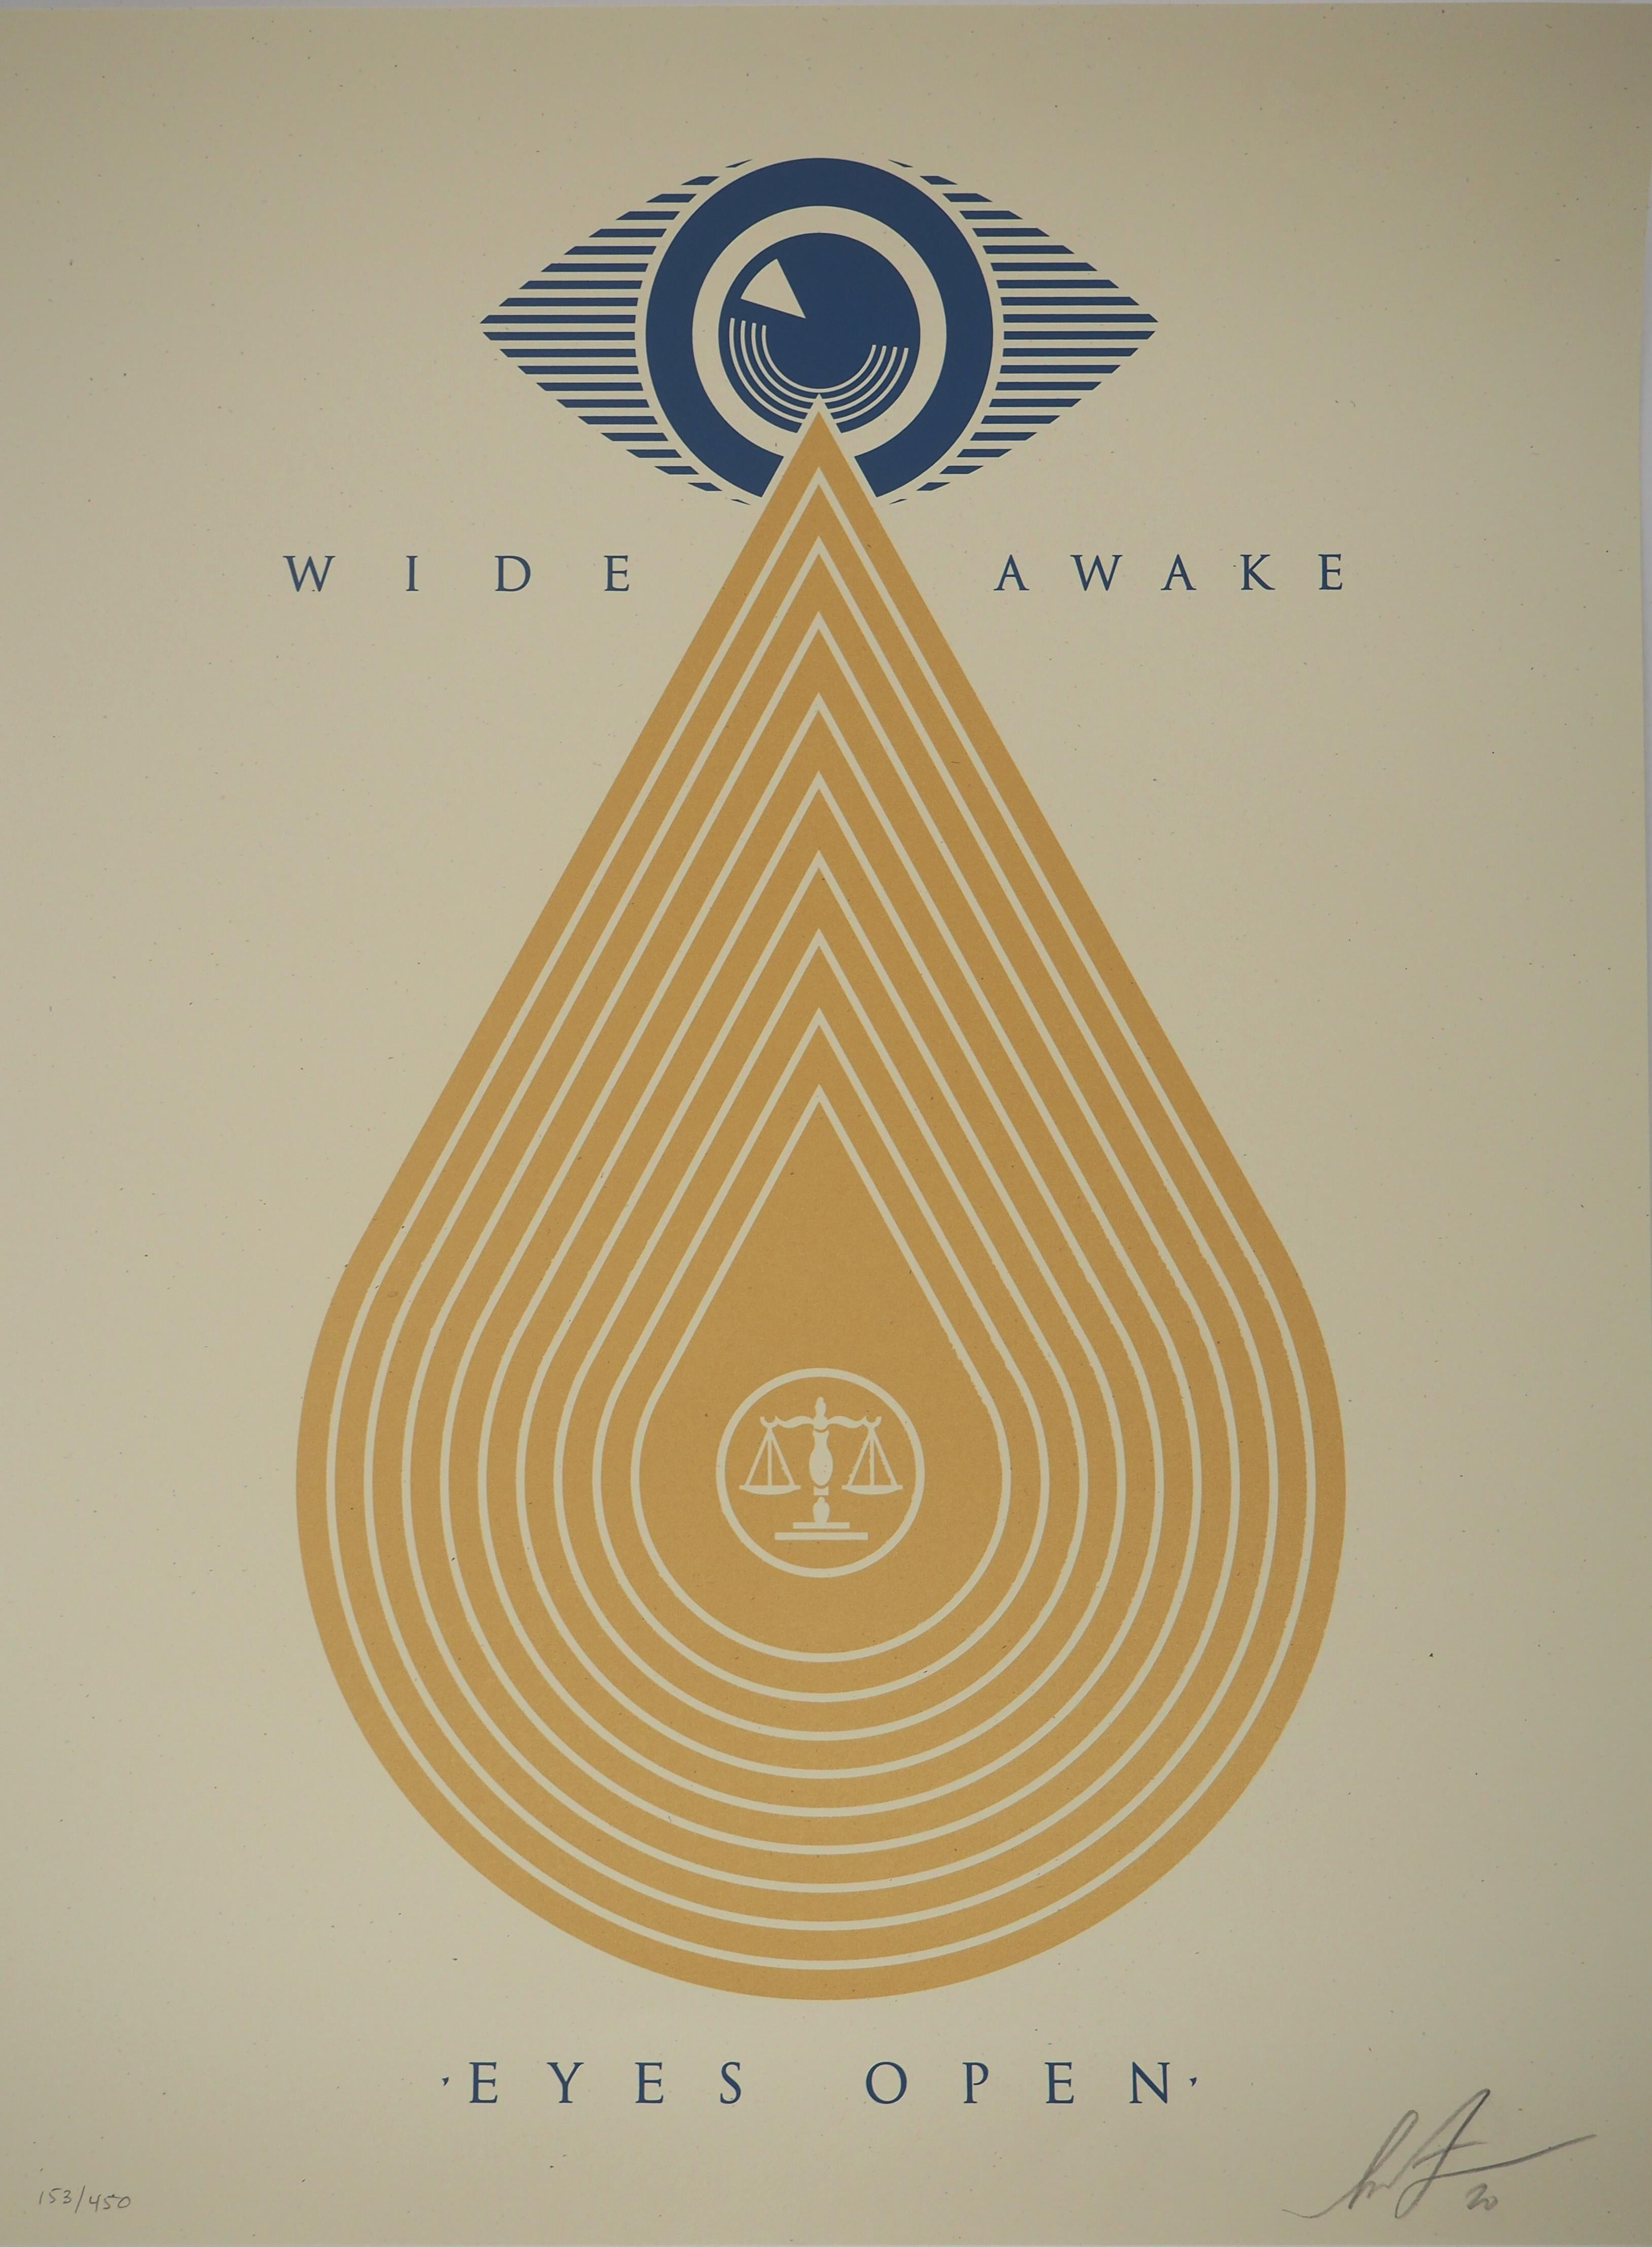 Eyes Open : Wide Awake (Justice) - Original Screenprint, Handsigned